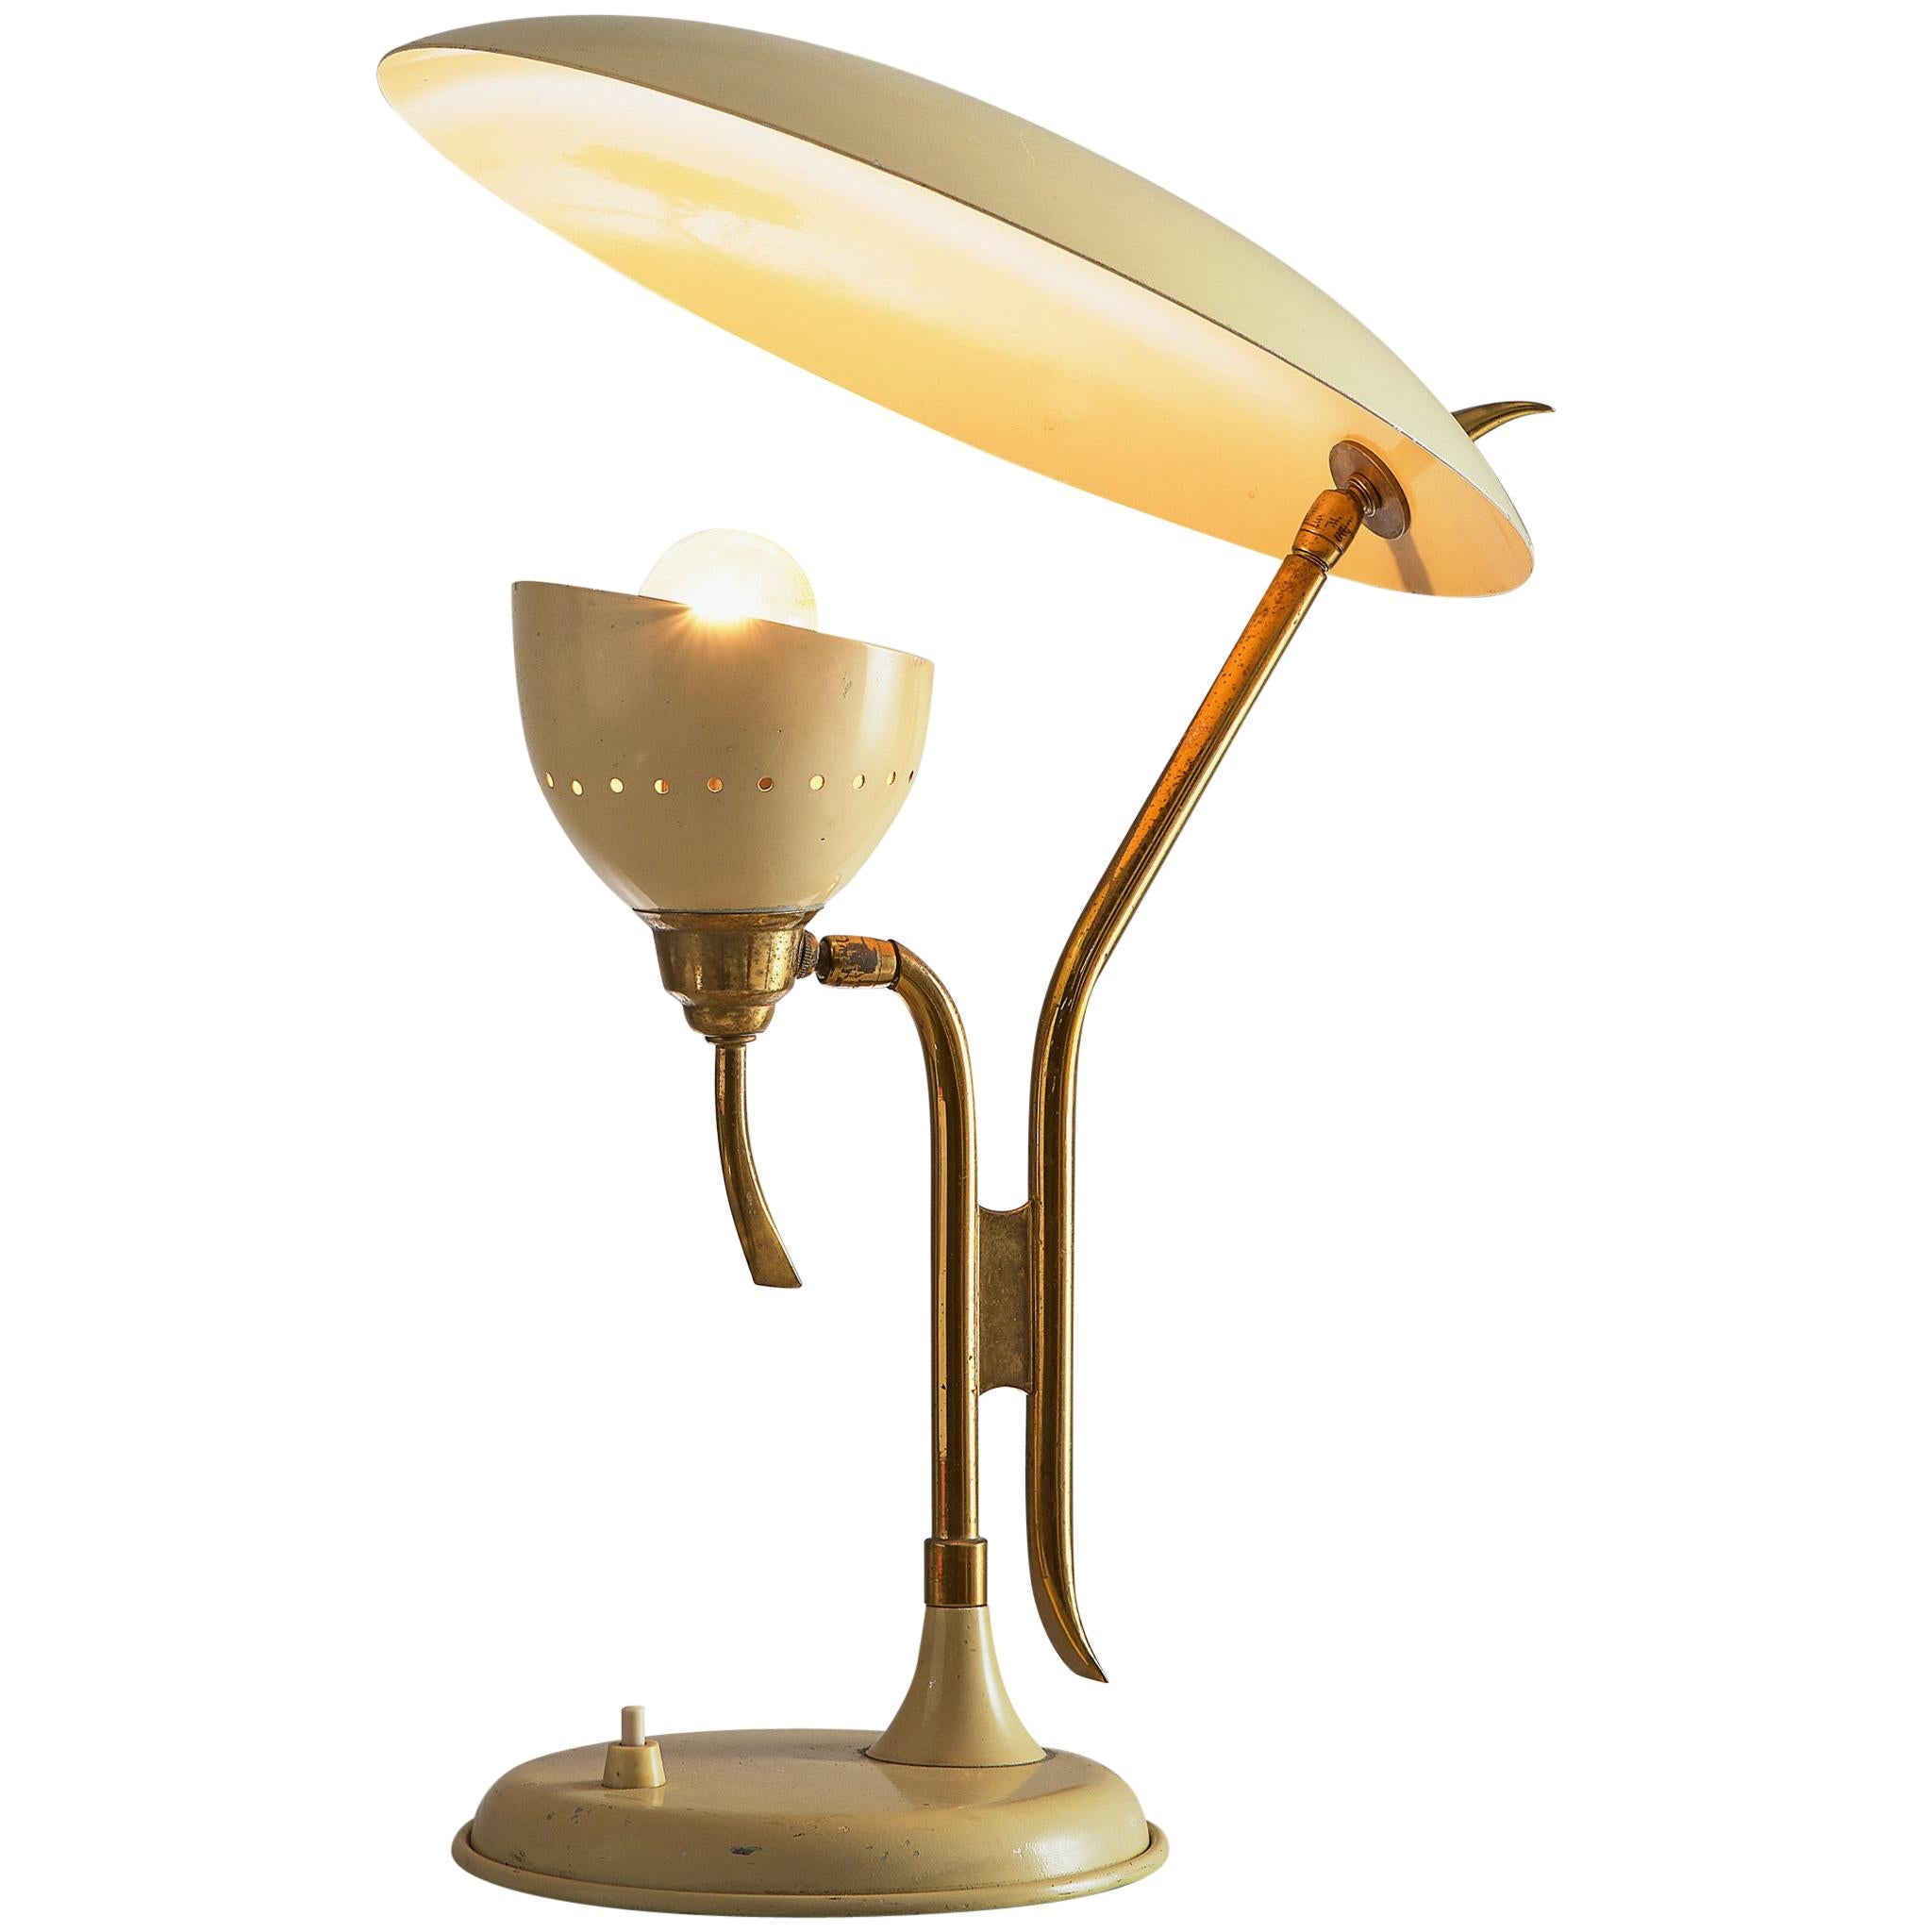 Lumen Milano Table Lamp, 1950s